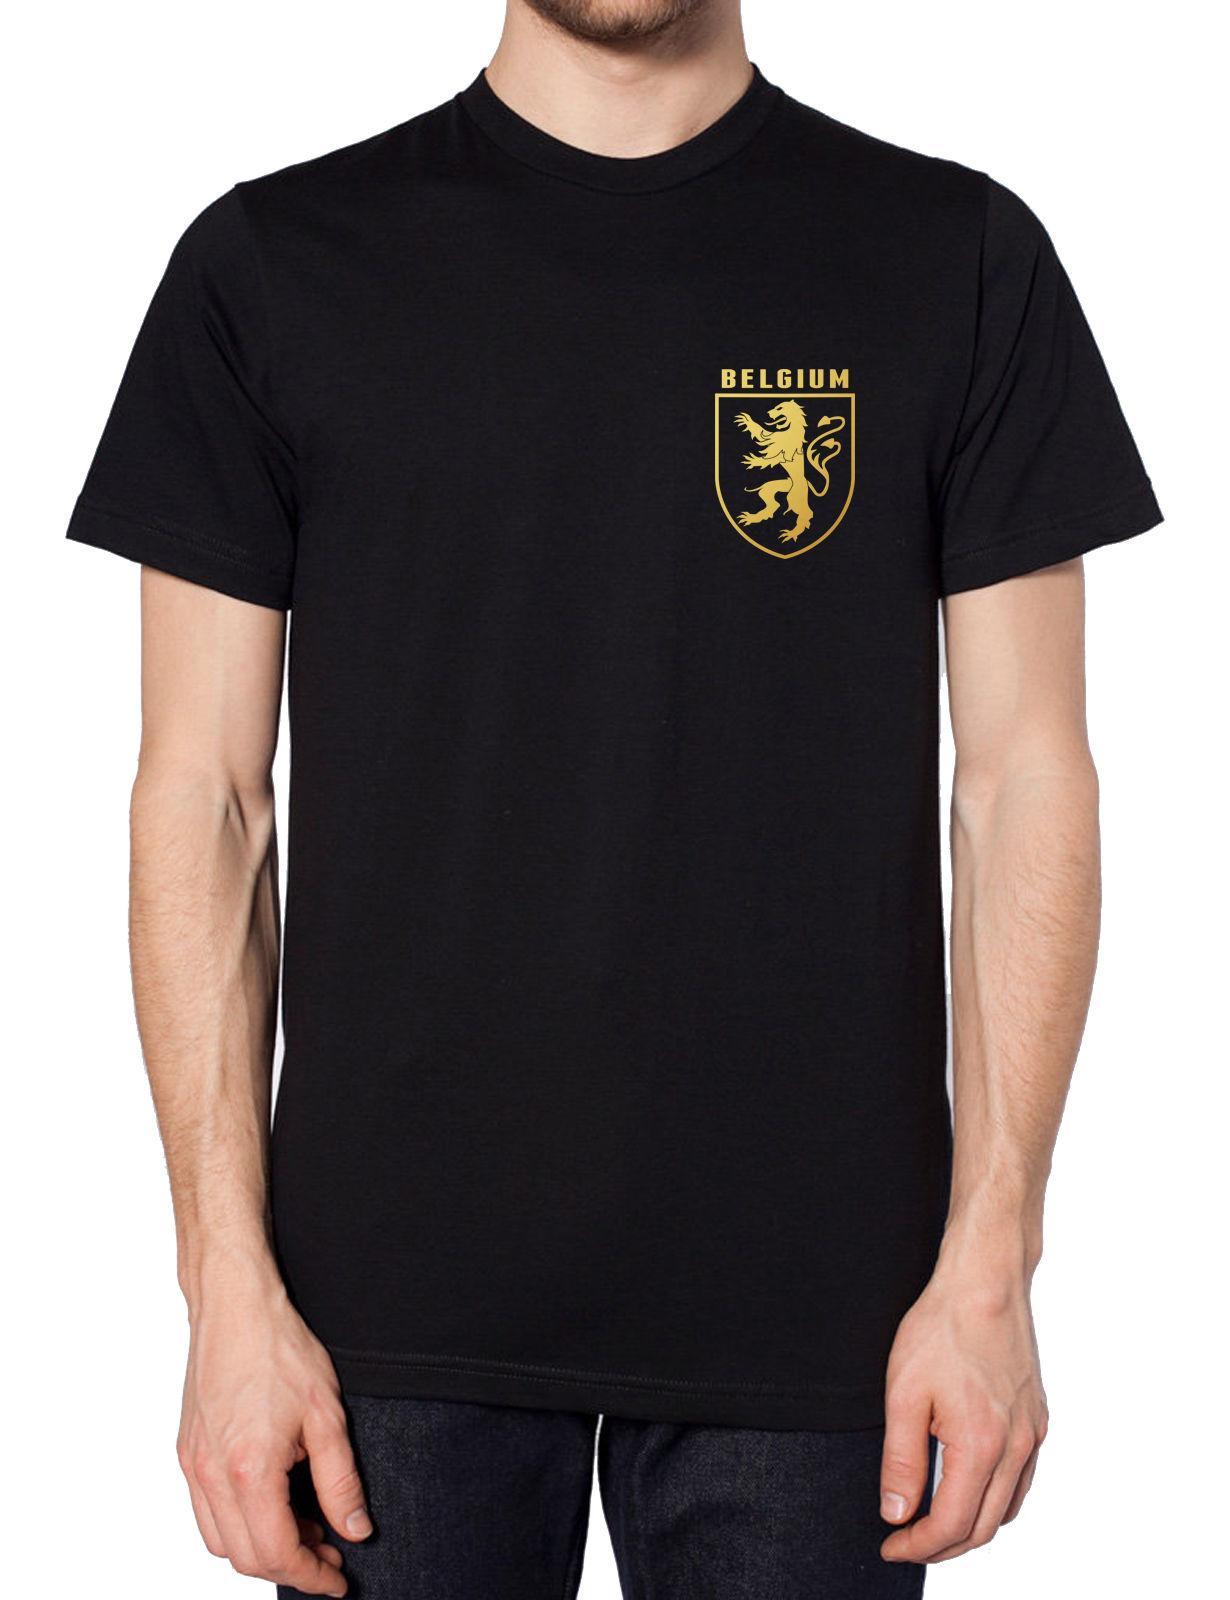 Retro Belgium Football Shirt T Shirt Russia World Cup 2018 Belgian Lion  Vintage Cool Casual Pride T Shirt Men Unisex New Fashion Tshirt Retro  Belgium Cheep ... e37662e8c